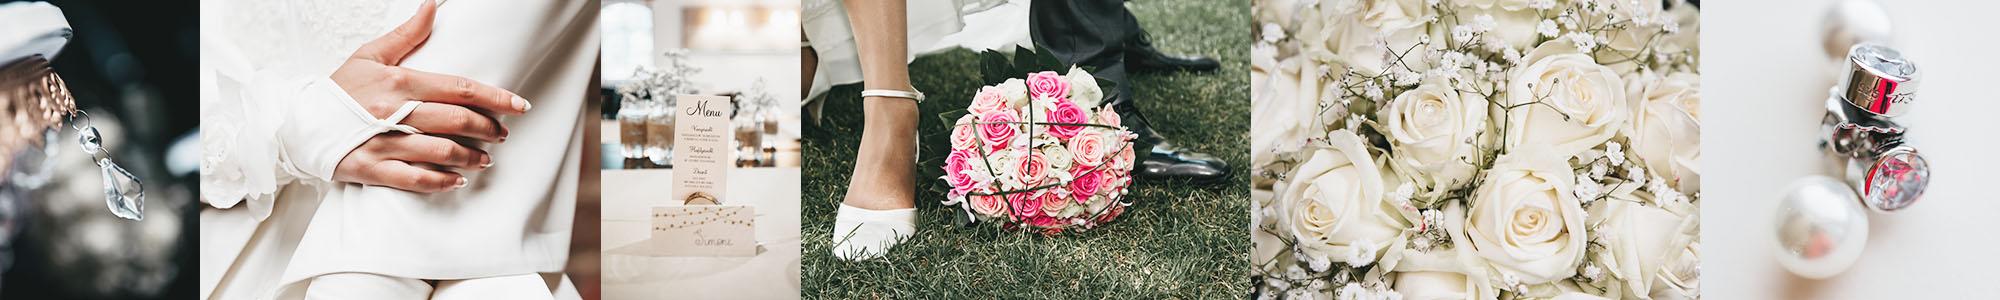 Kosten bruidsreportage